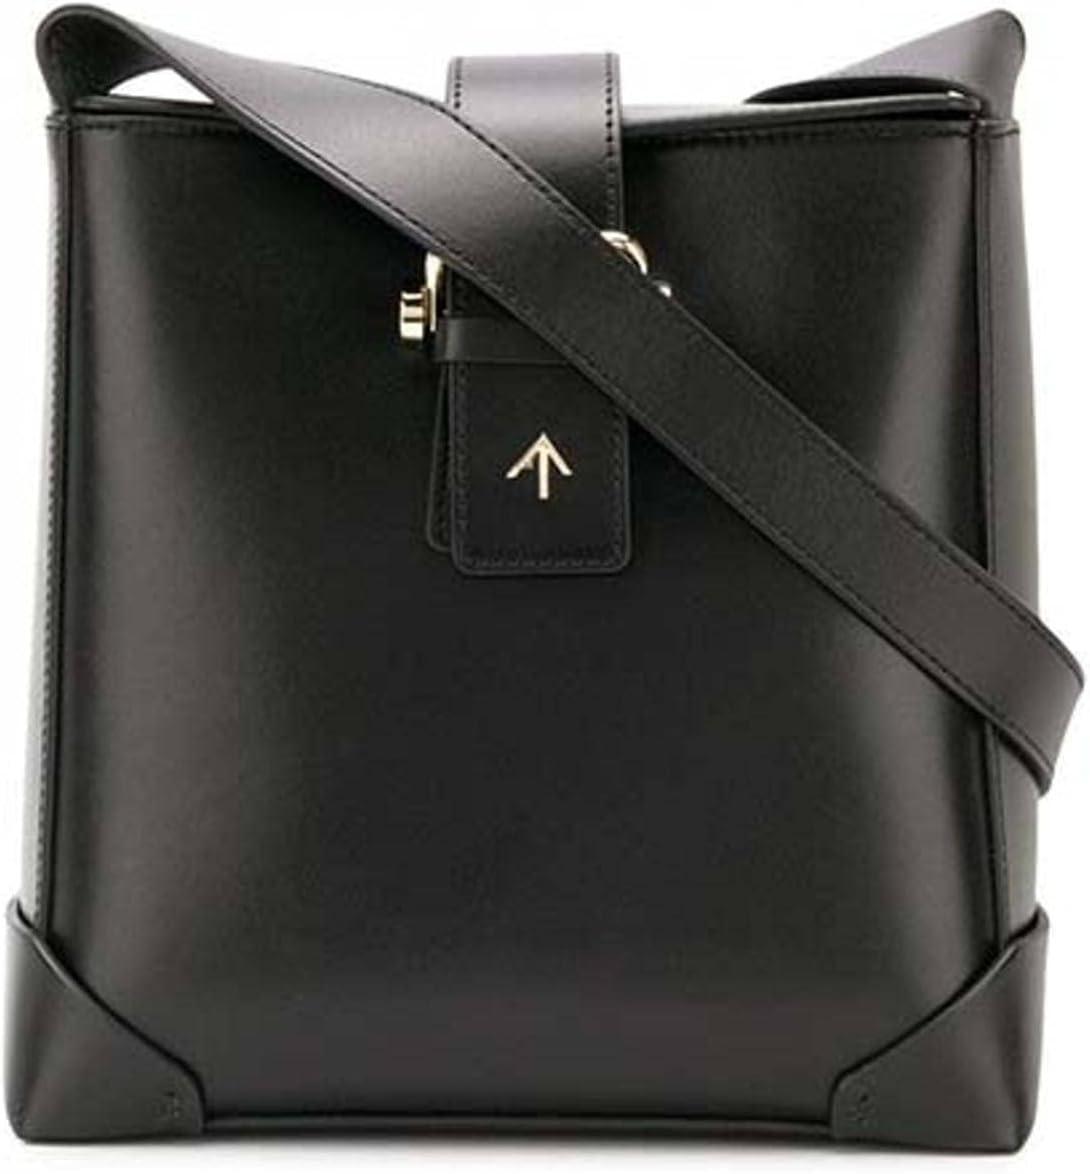 Handbag Women's Bag Shoulder Leather Swing Hit Portabl Color San Jose Mall Quantity limited